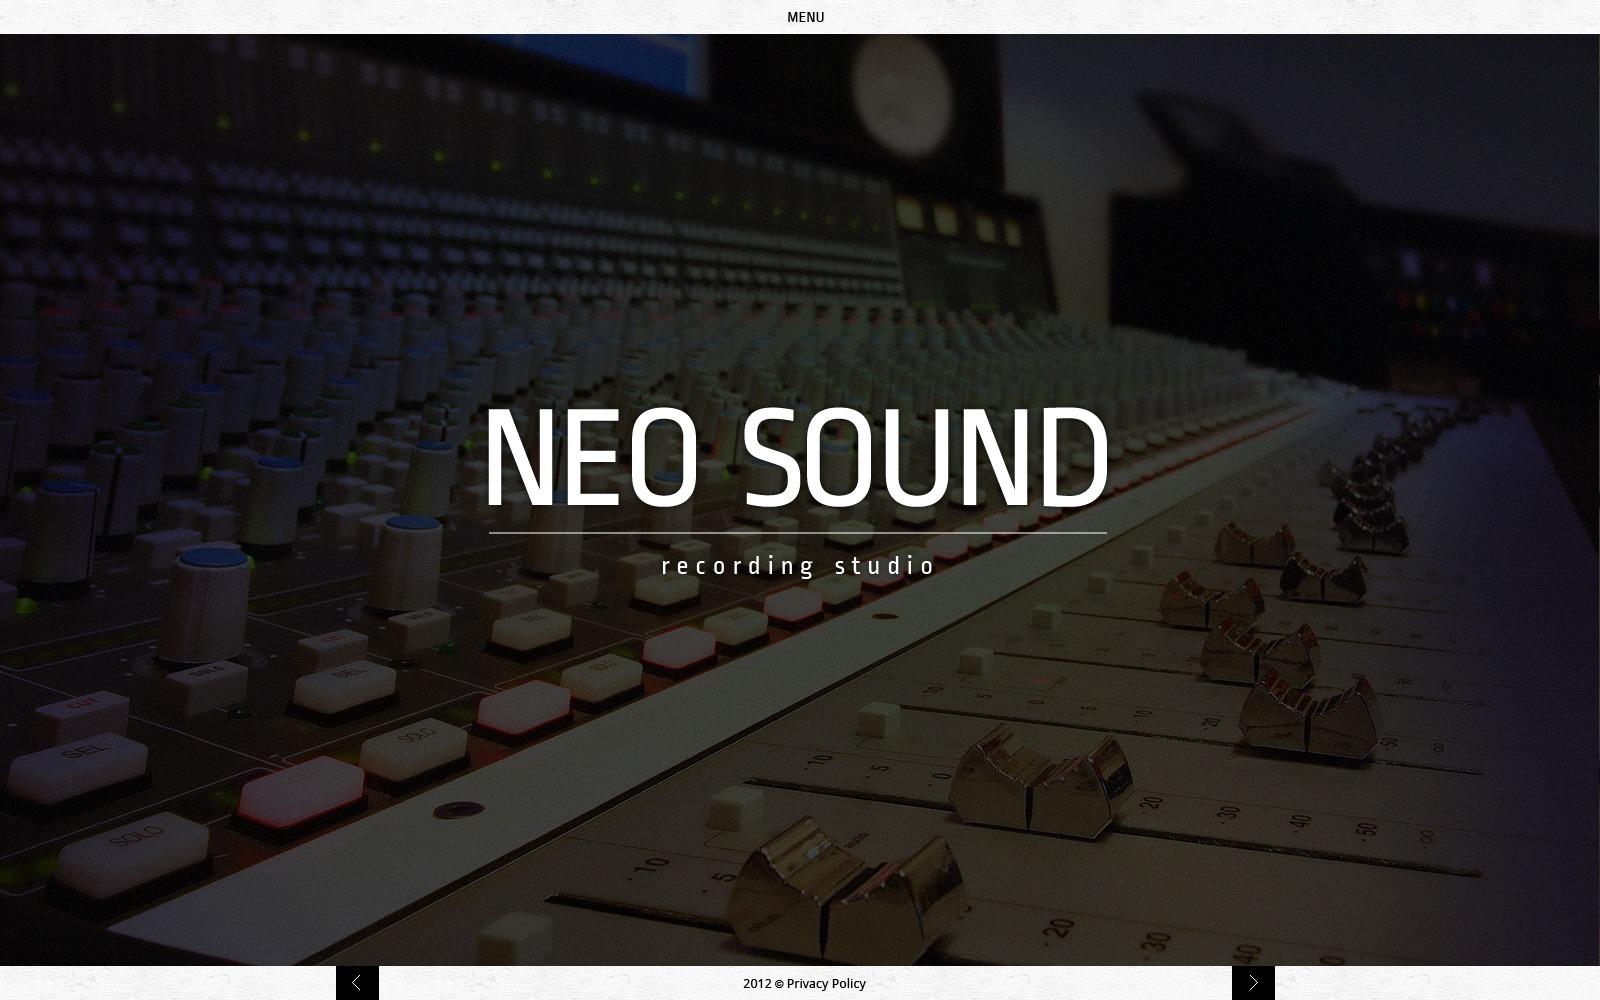 Recording studio website template 40907 recording studio website template pronofoot35fo Image collections